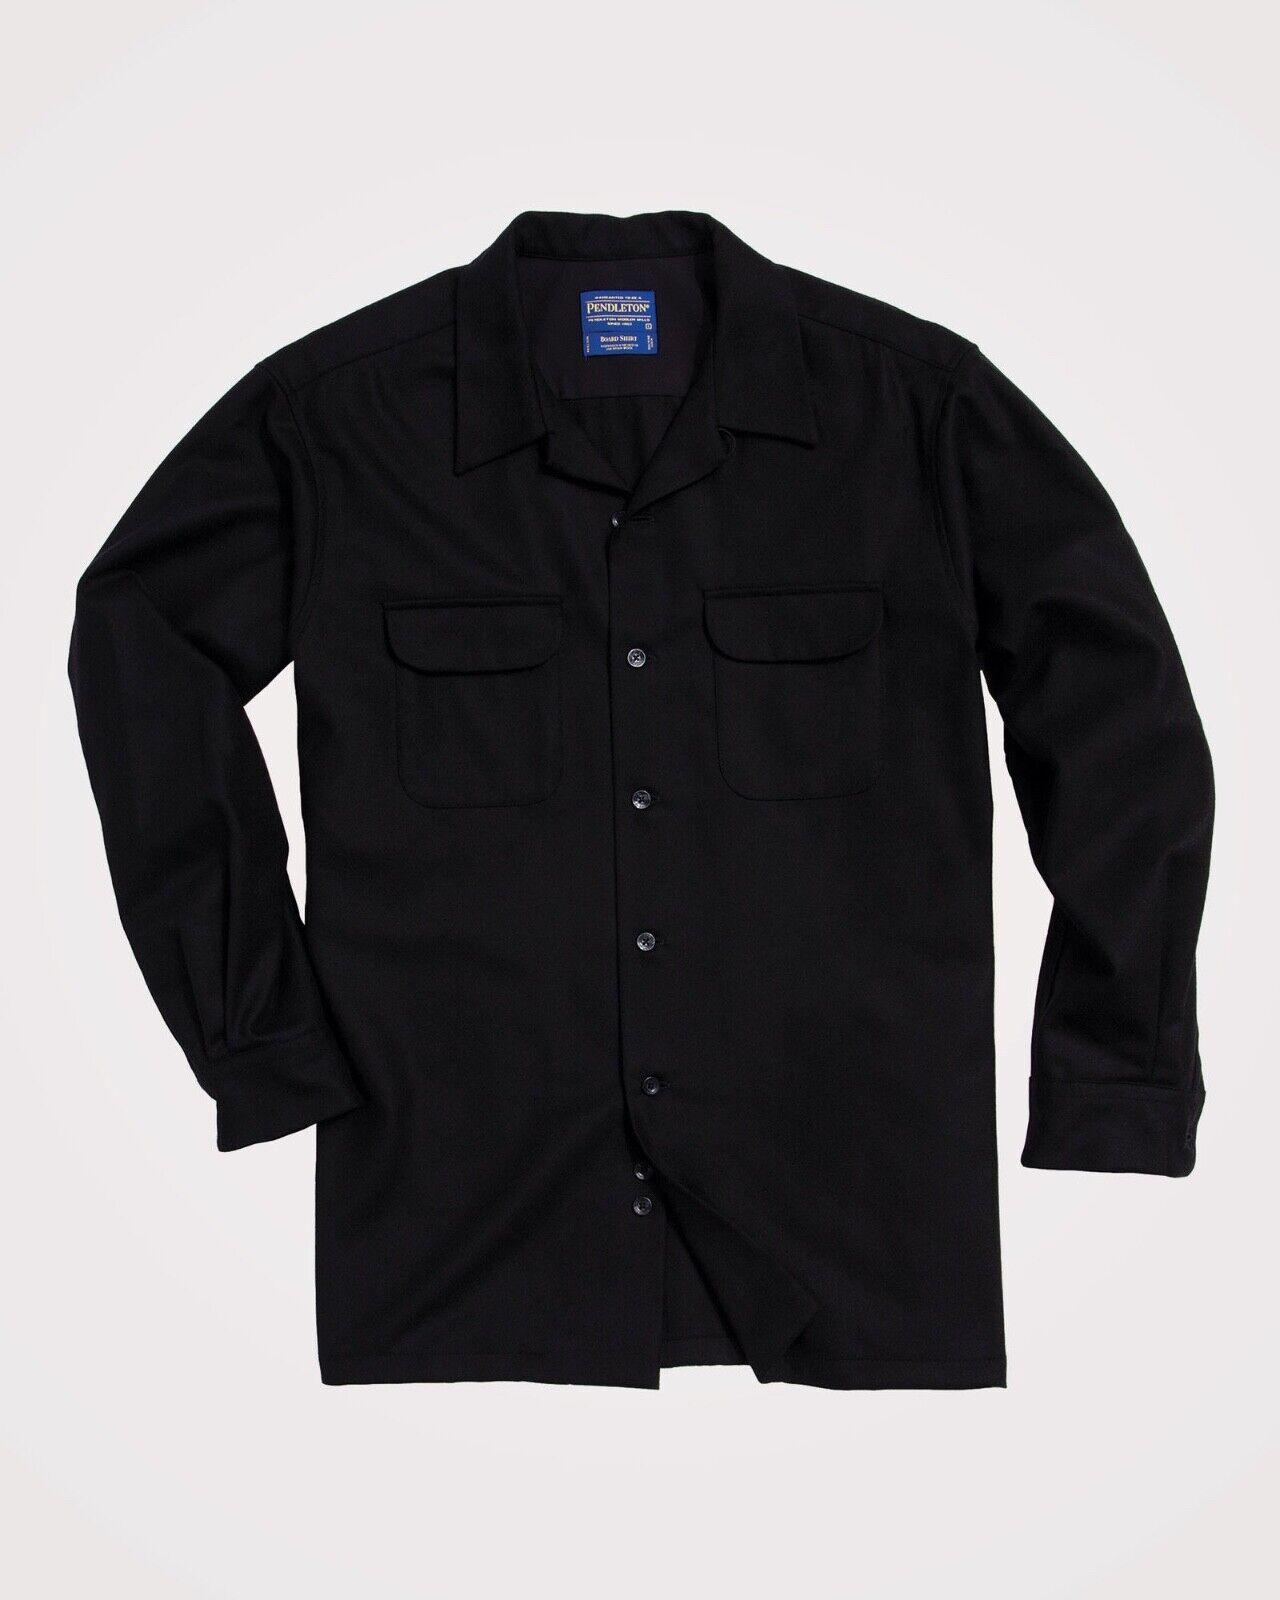 Pendleton Original Board Shirt 100% Umatilla Virgin Wool Classic Fit 20042